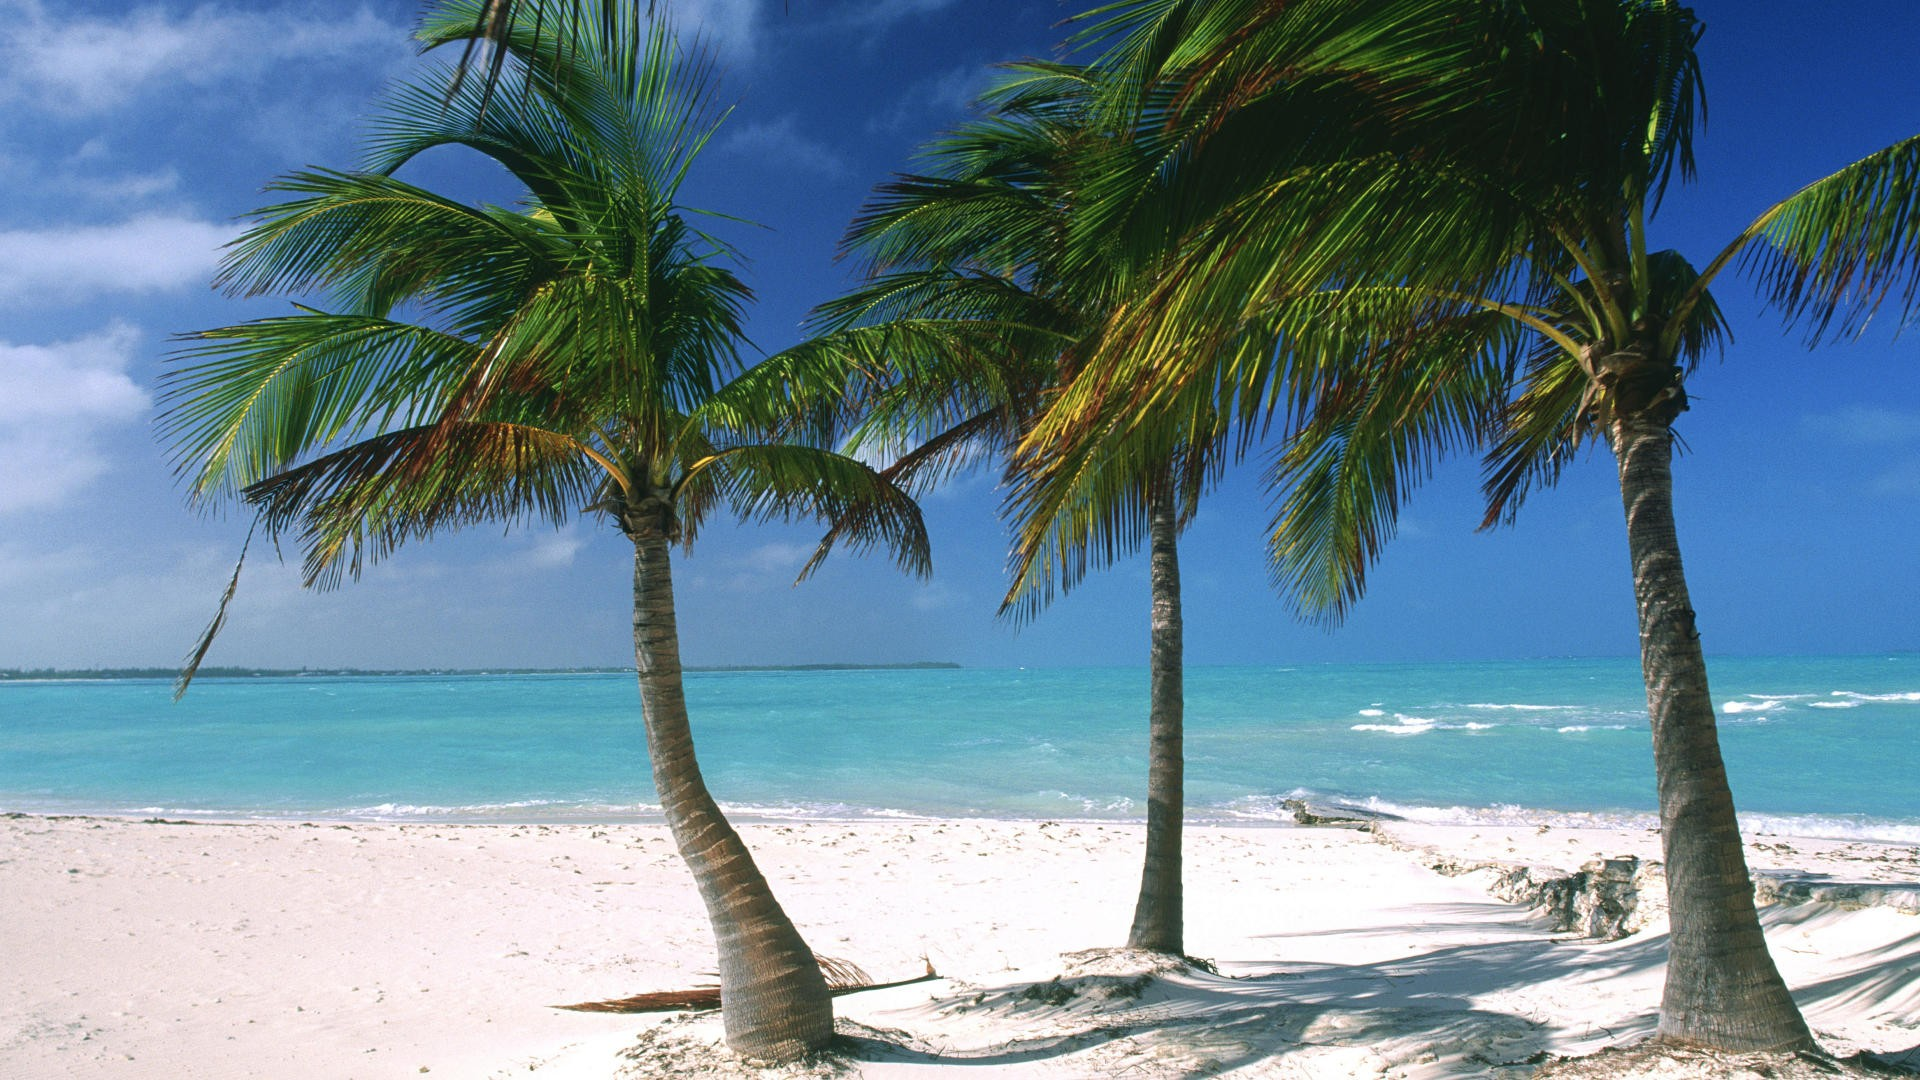 Ocean Beach Wallpaper 1920x1080 Ocean Beach World Islands Palm 1920x1080